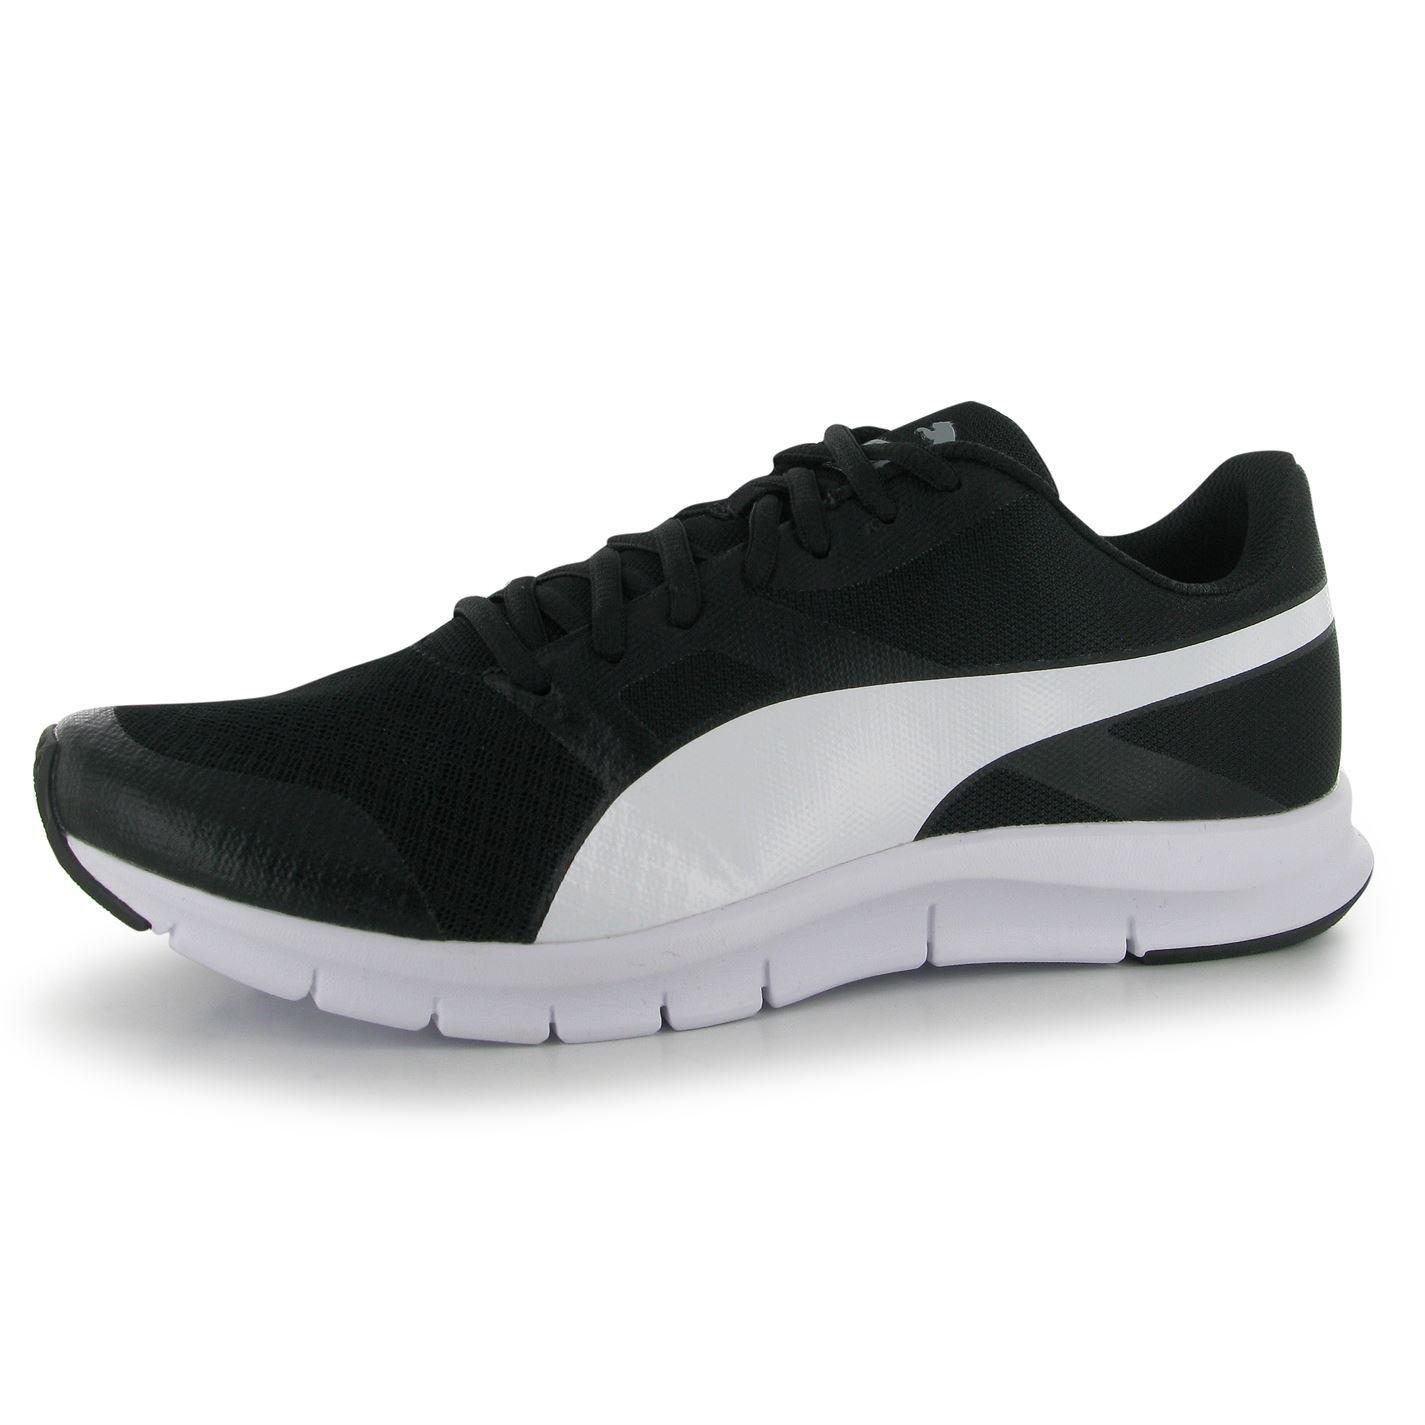 Puma Flex Racer Zapatillas de running para hombre negro/blanco ...